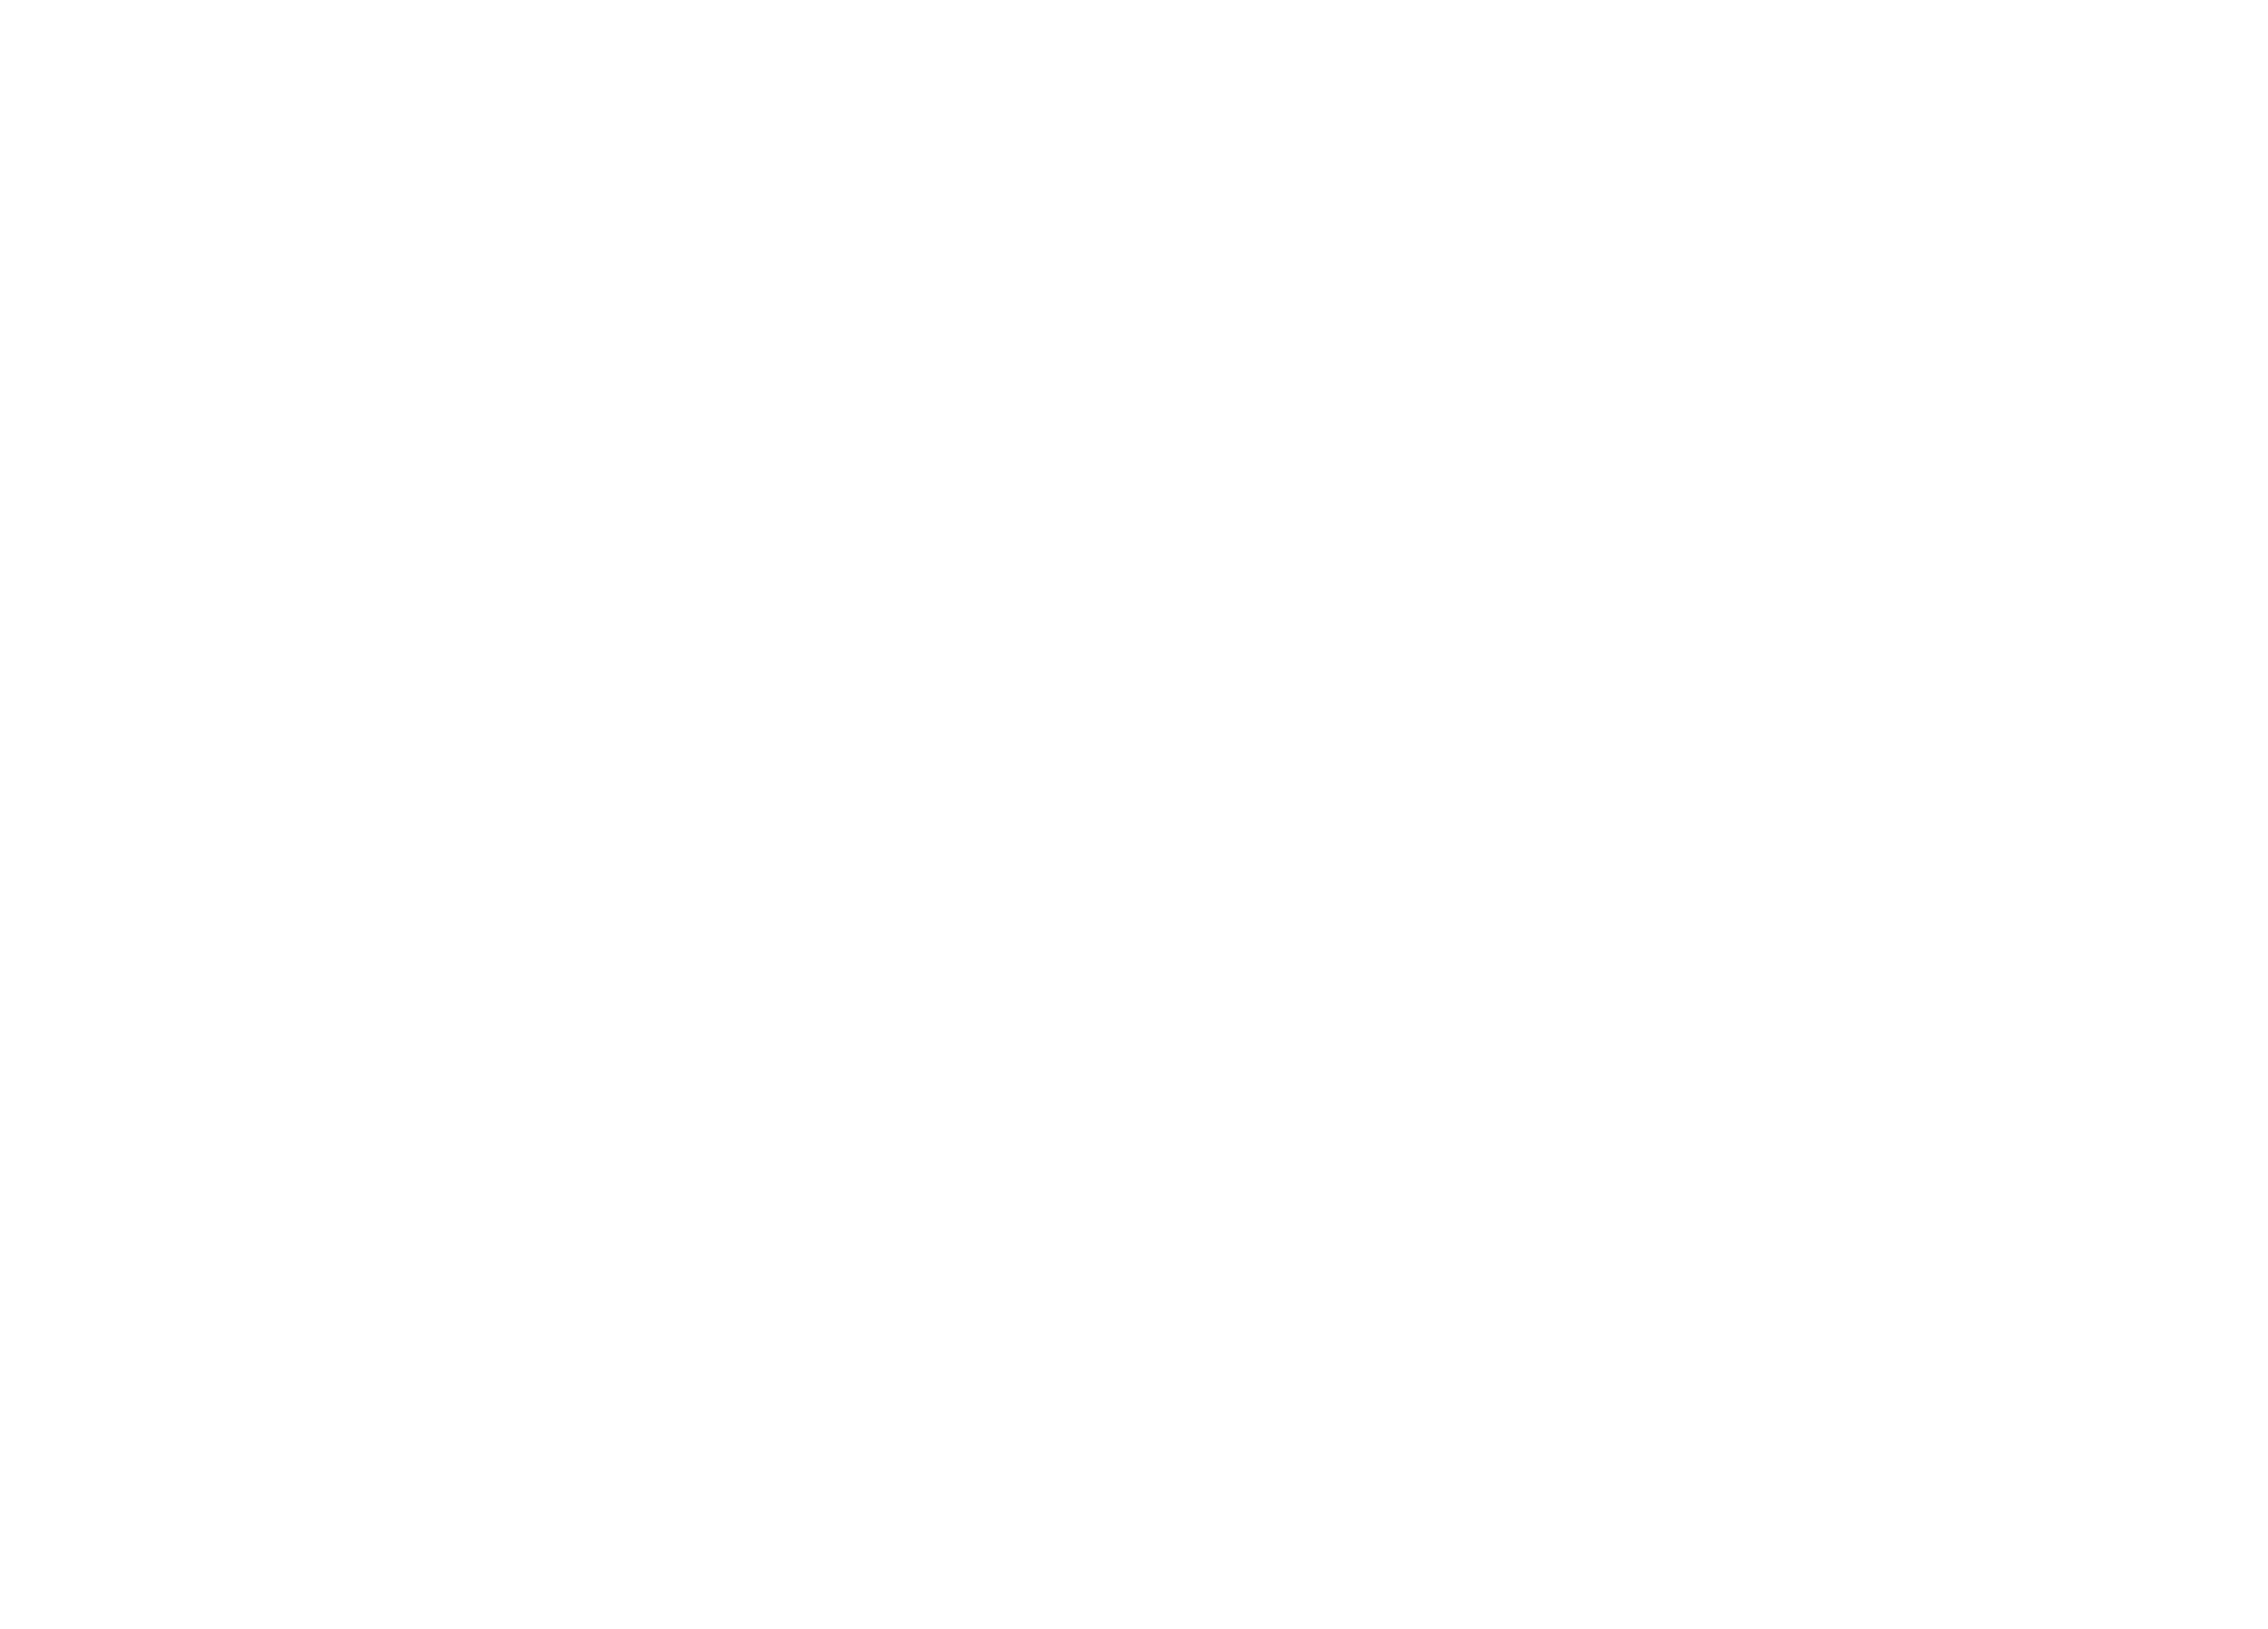 Born Leaders โรงเรียนสอนภาษาและพัฒนาการหลักสูตรปฐมวัย สำหรับเด็กอายุ 6 เดือน - 12 ปี